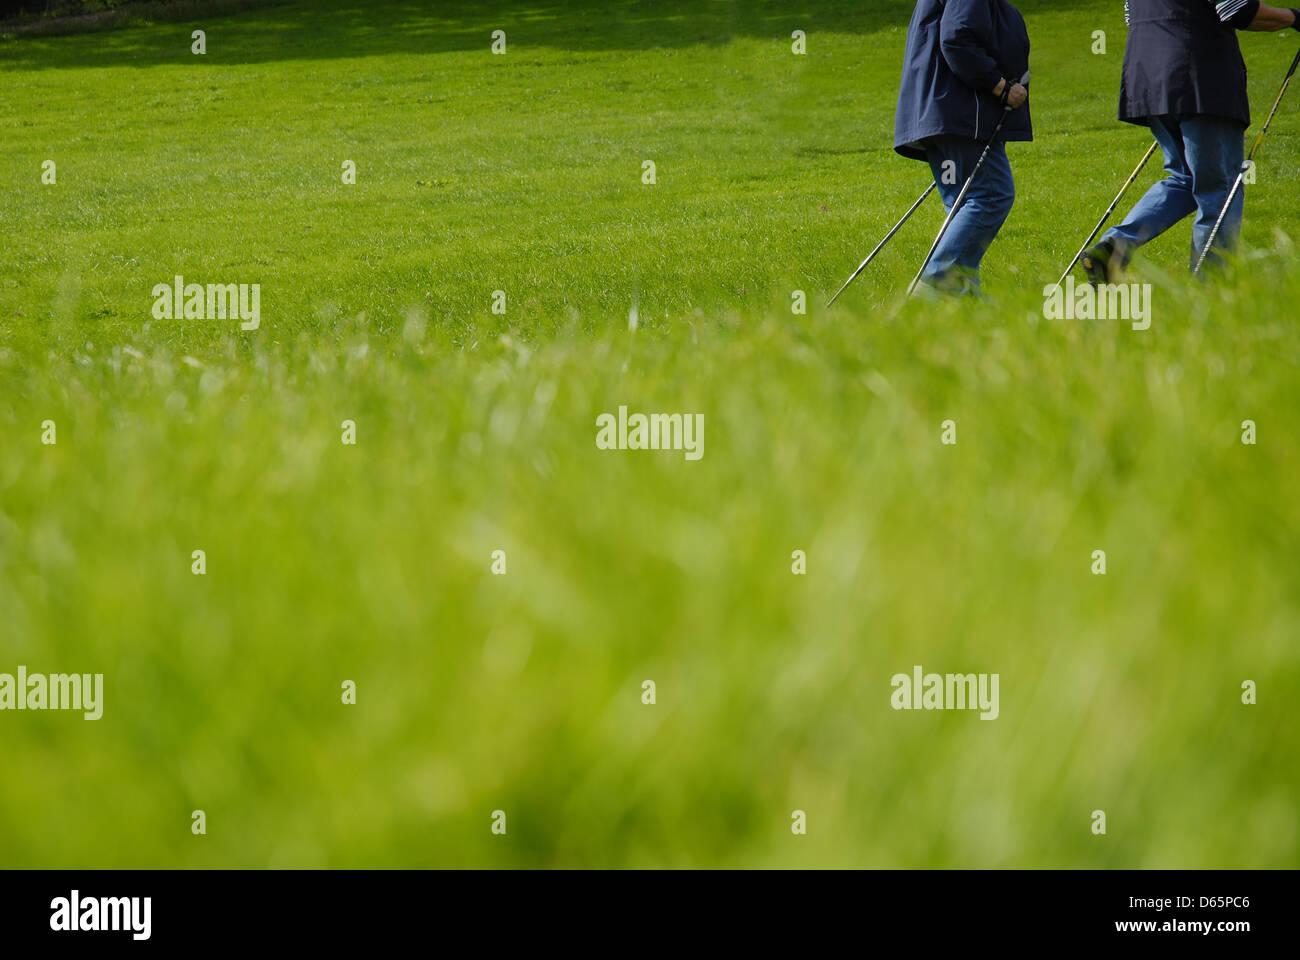 sports,fitness,leisure,nordic walking - Stock Image